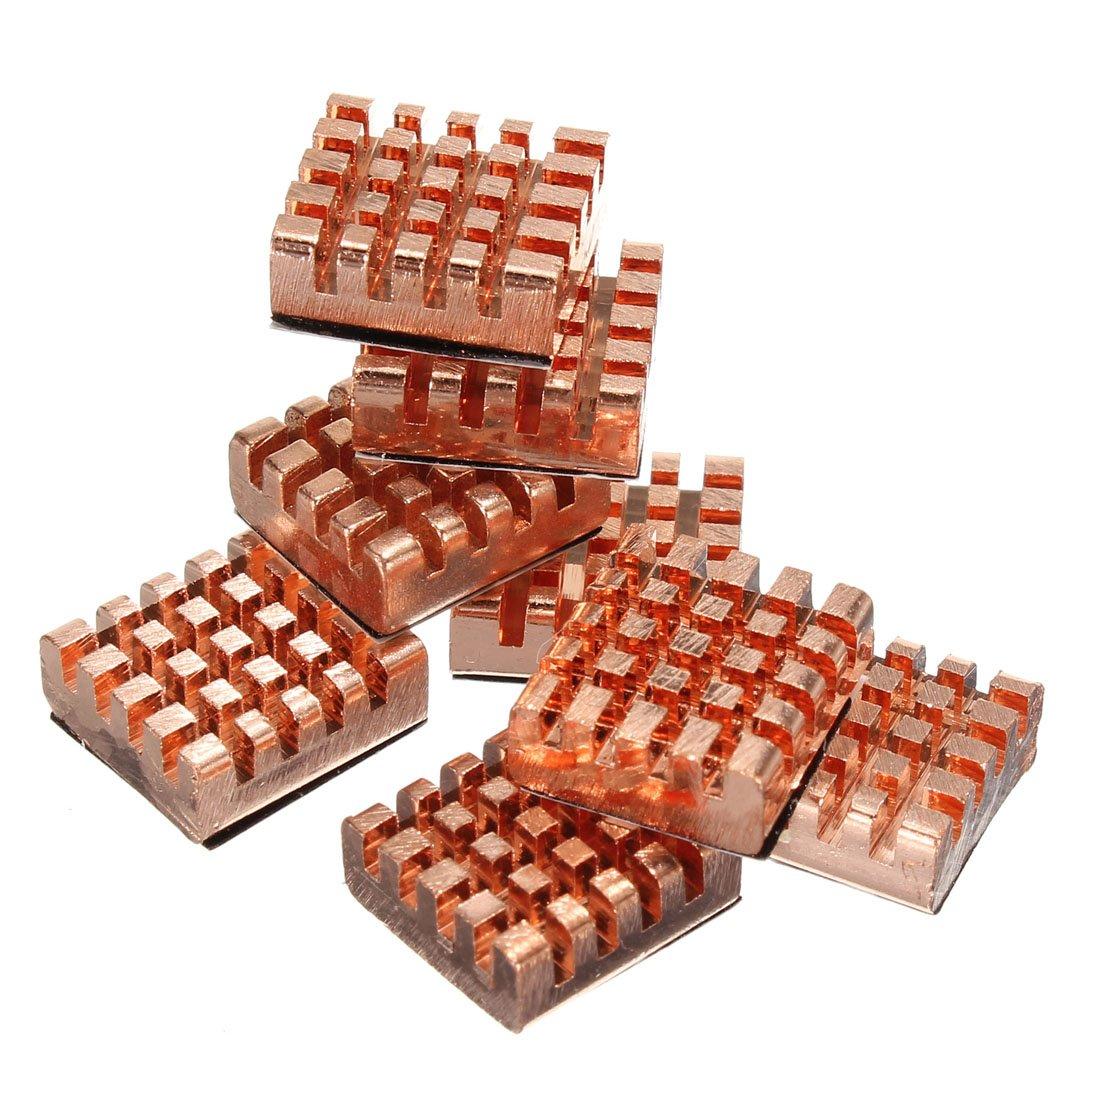 8pcs Memory Copper Heat Sink For DDR DDR2 DDR3 RAM 12x13x5mm